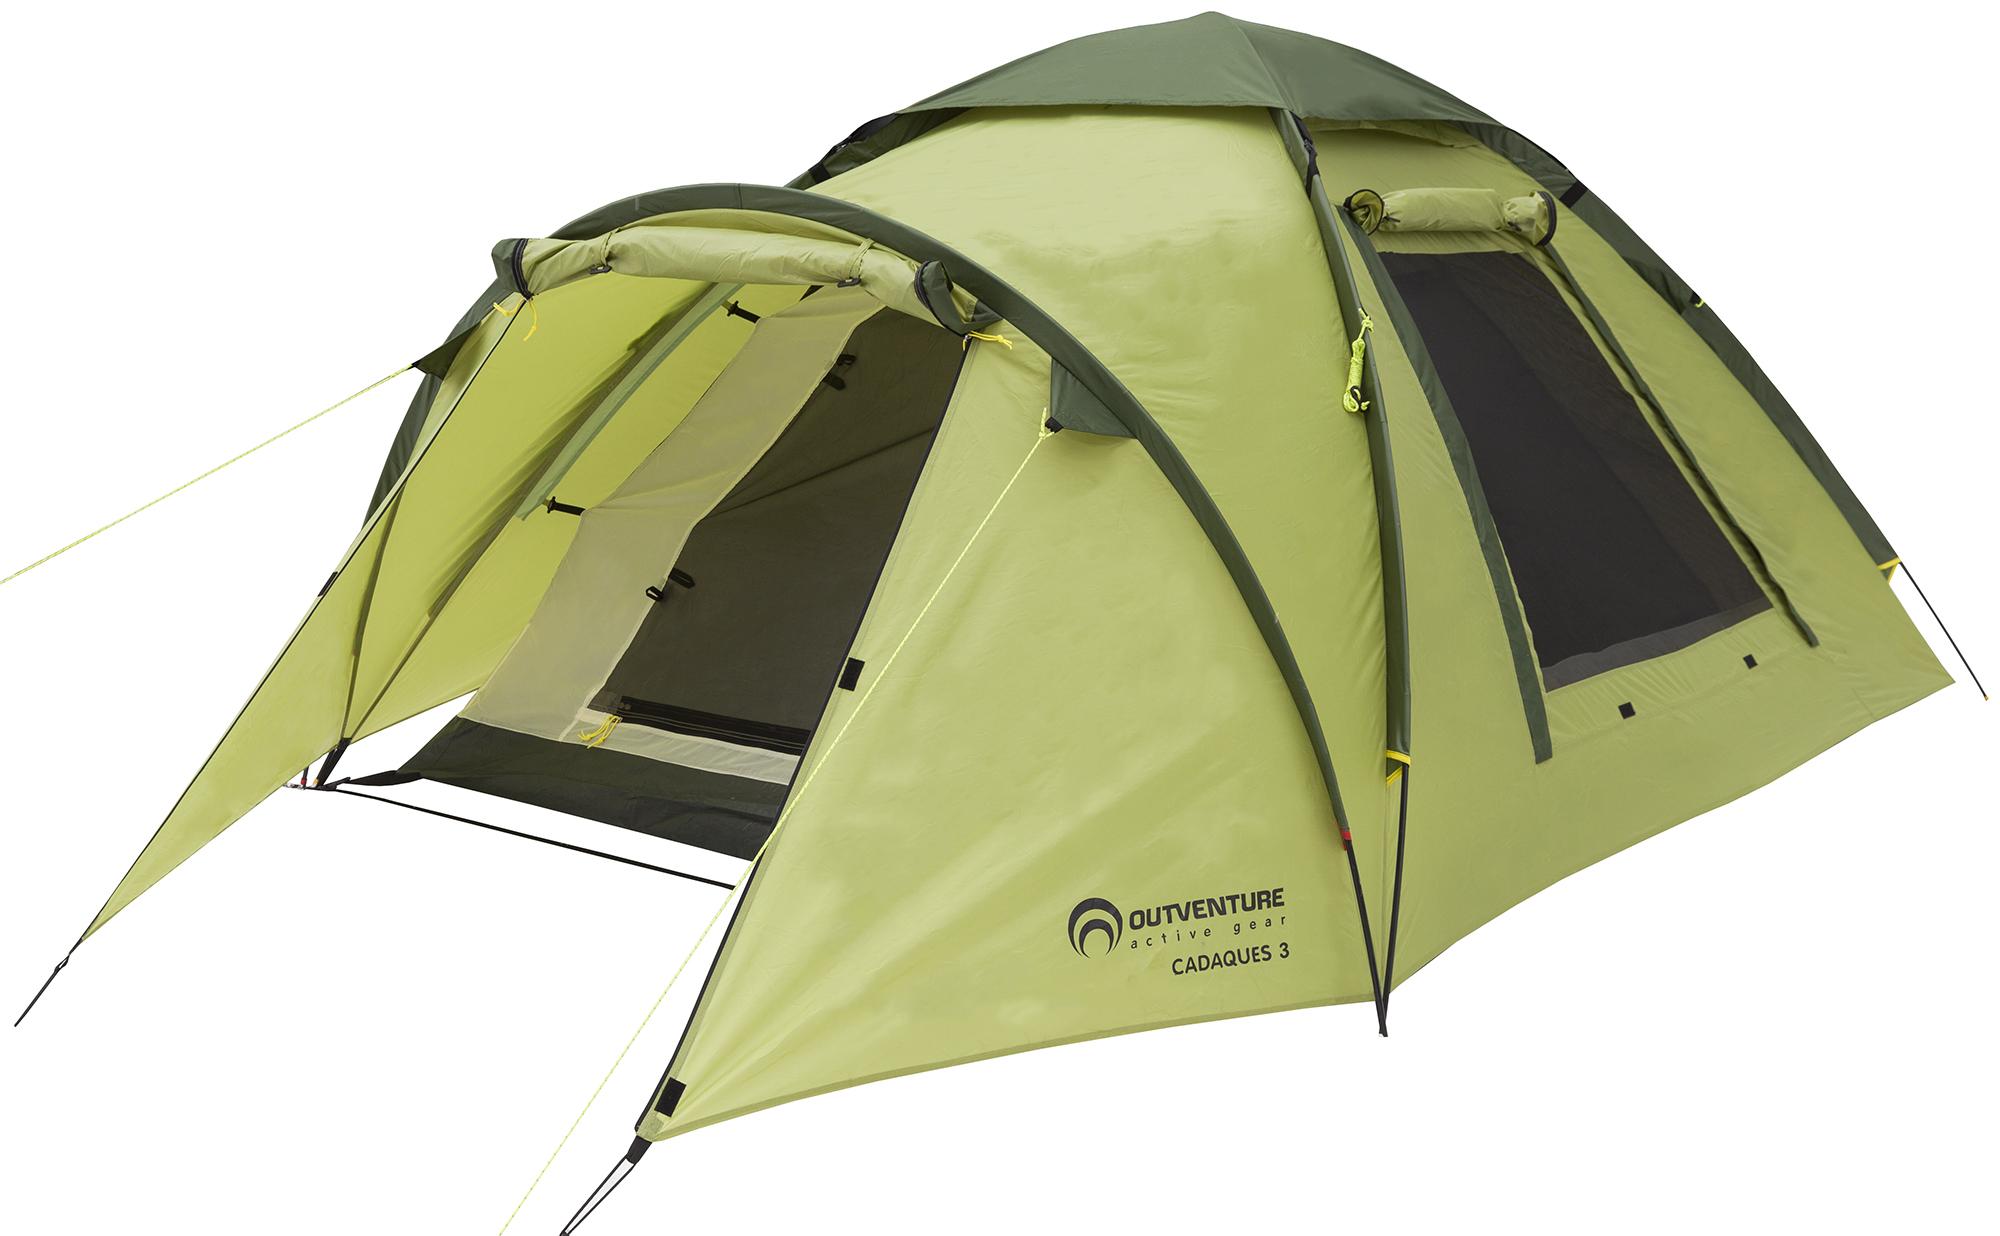 Outventure Outventure Cadaques 3 палатка трехместная campack tent breeze explorer 3